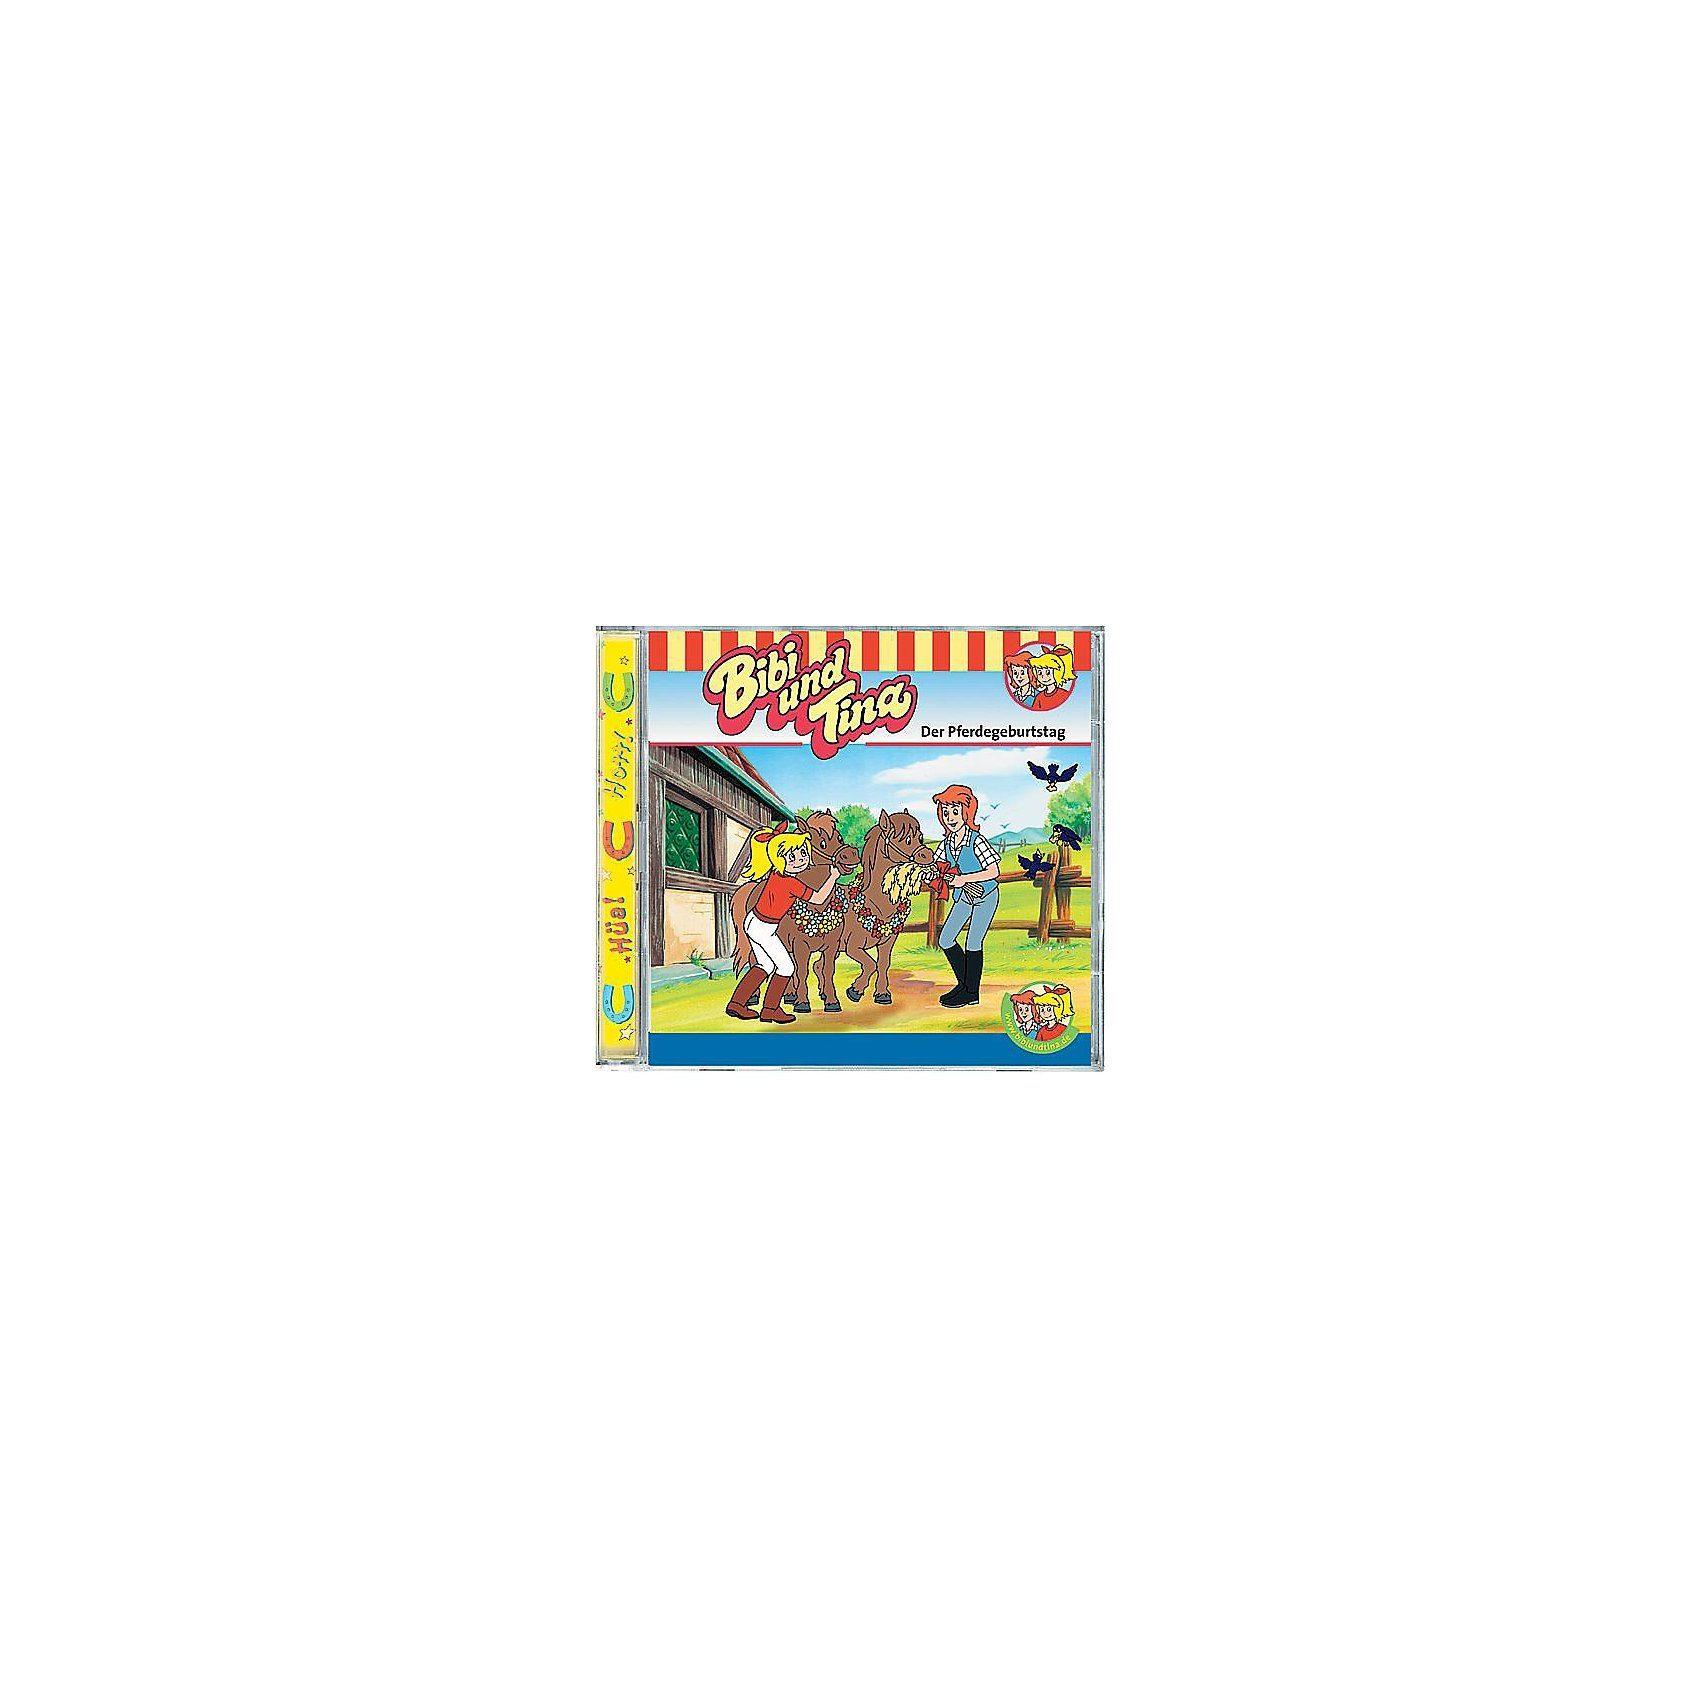 Kiddinx CD Bibi & Tina 27 - Der Pferdegeburtstag